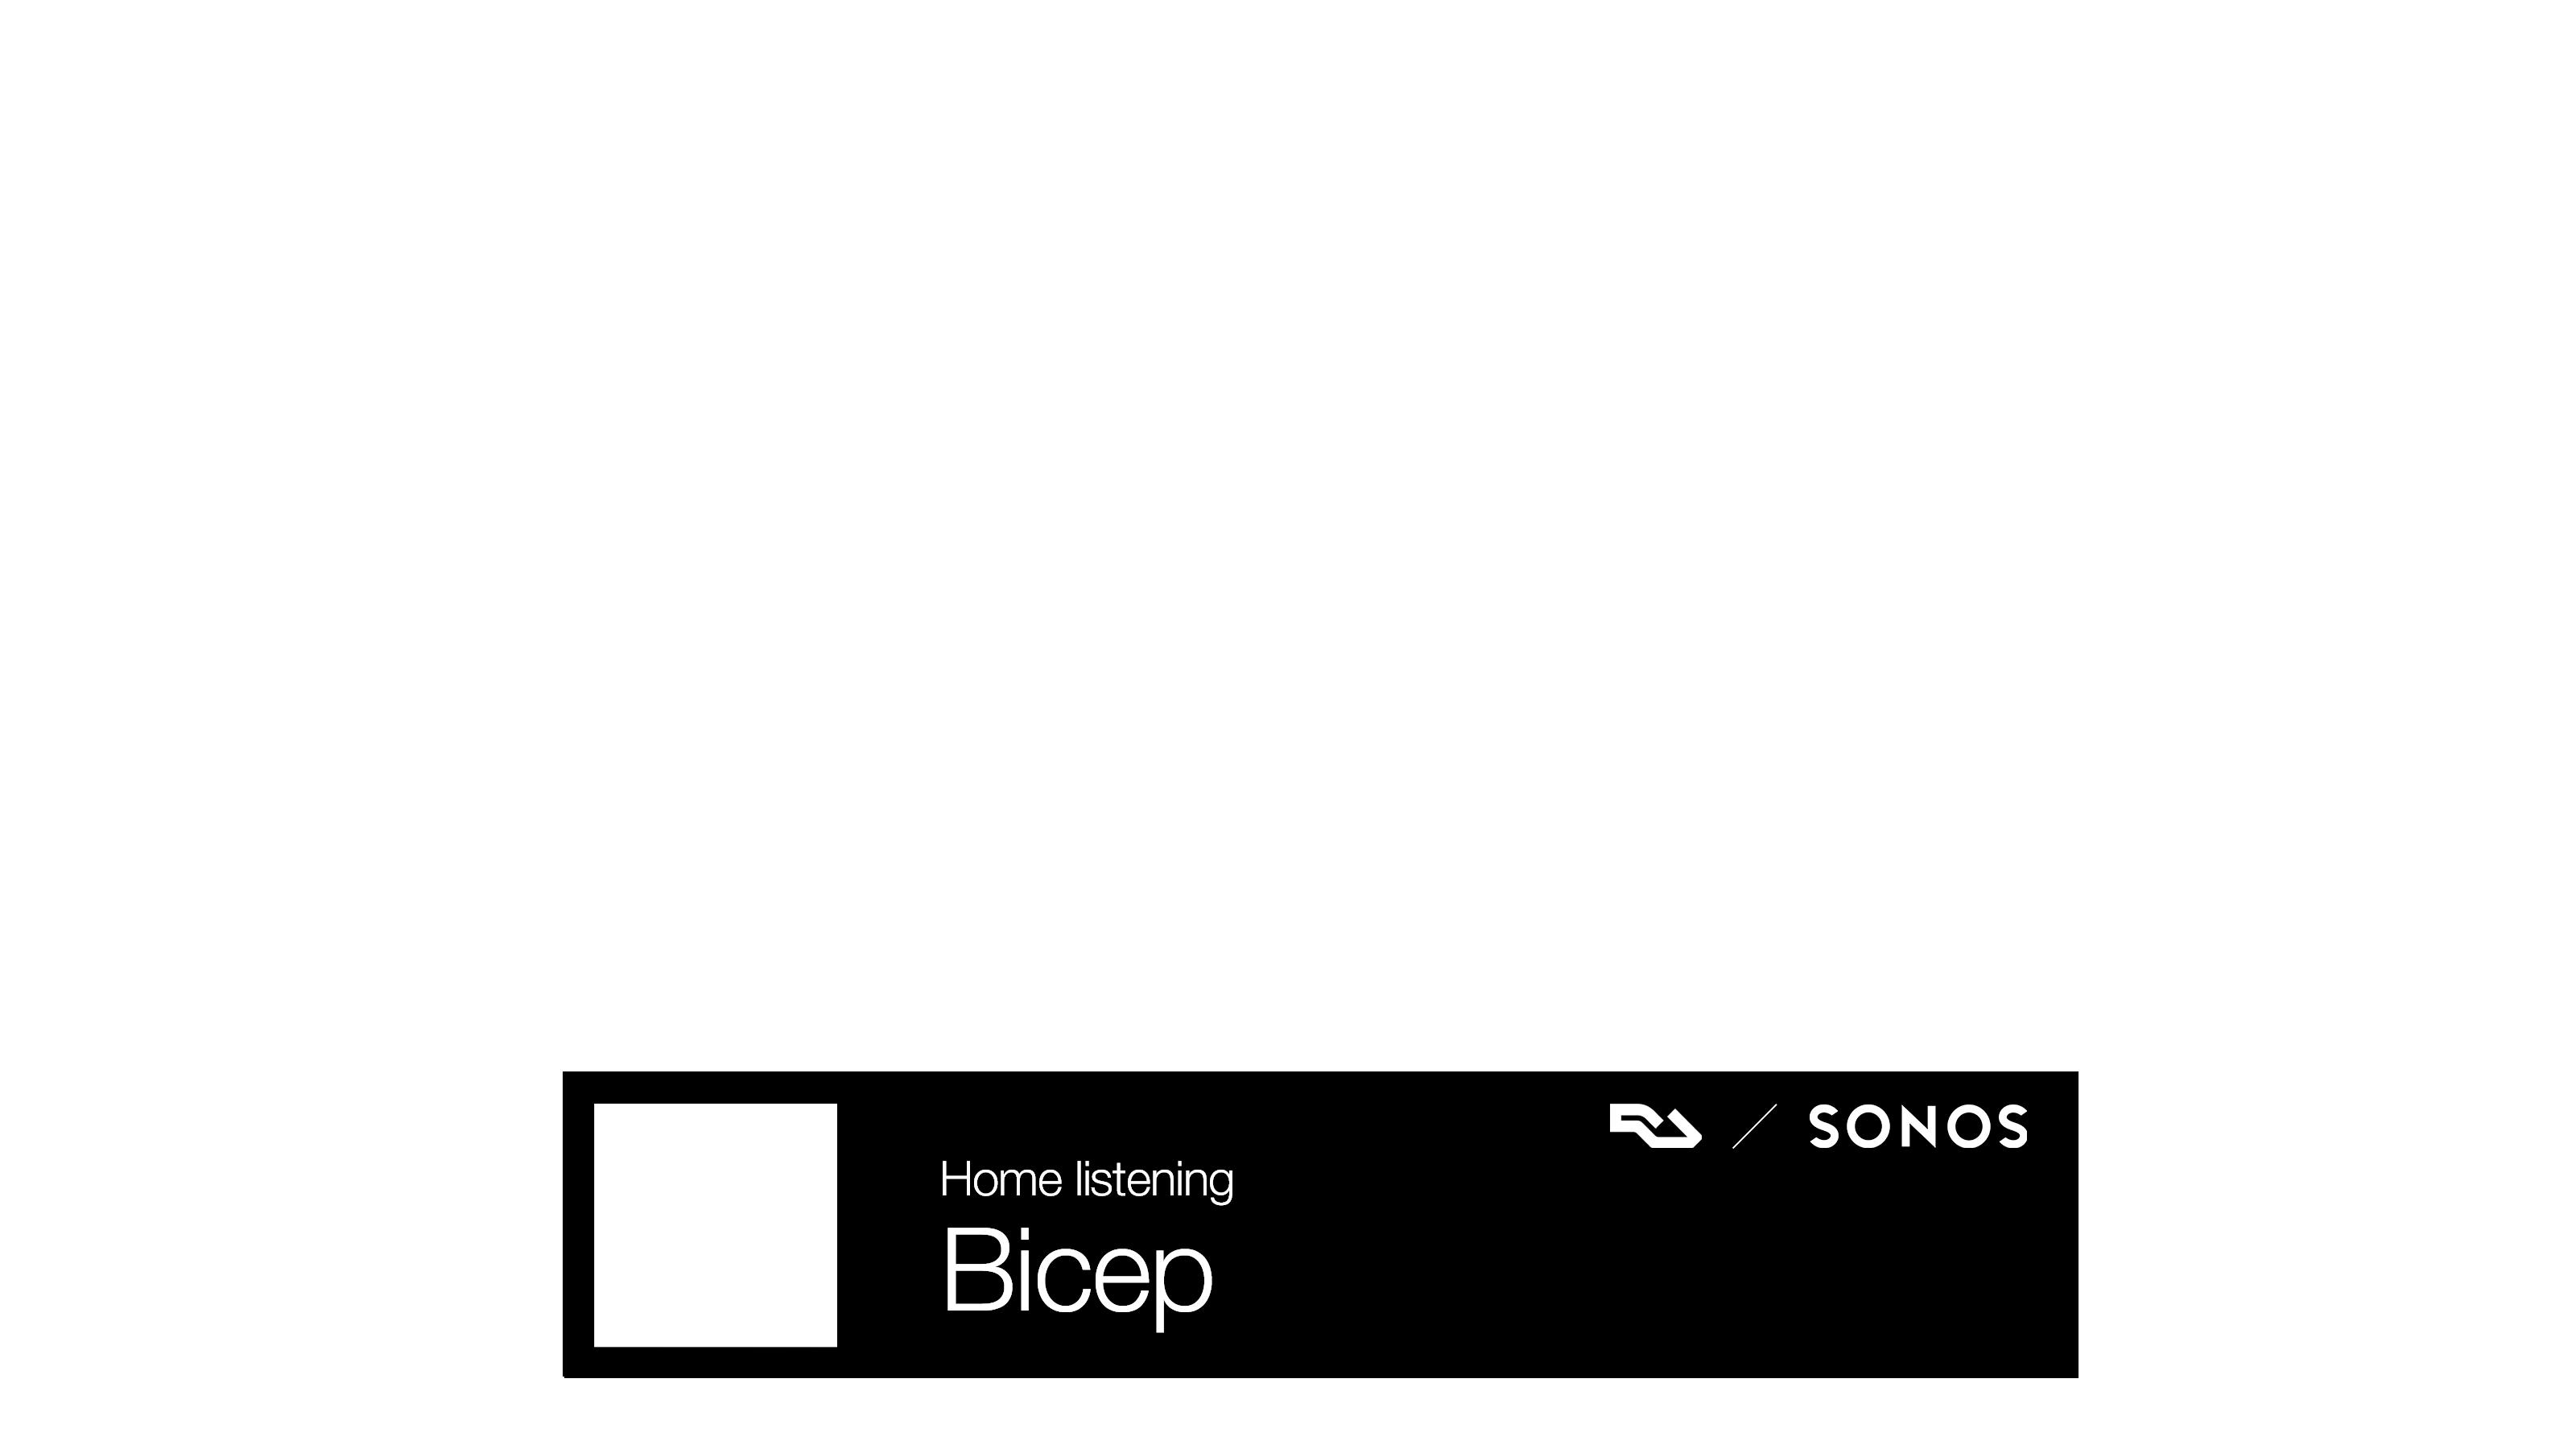 Home listening: Bicep